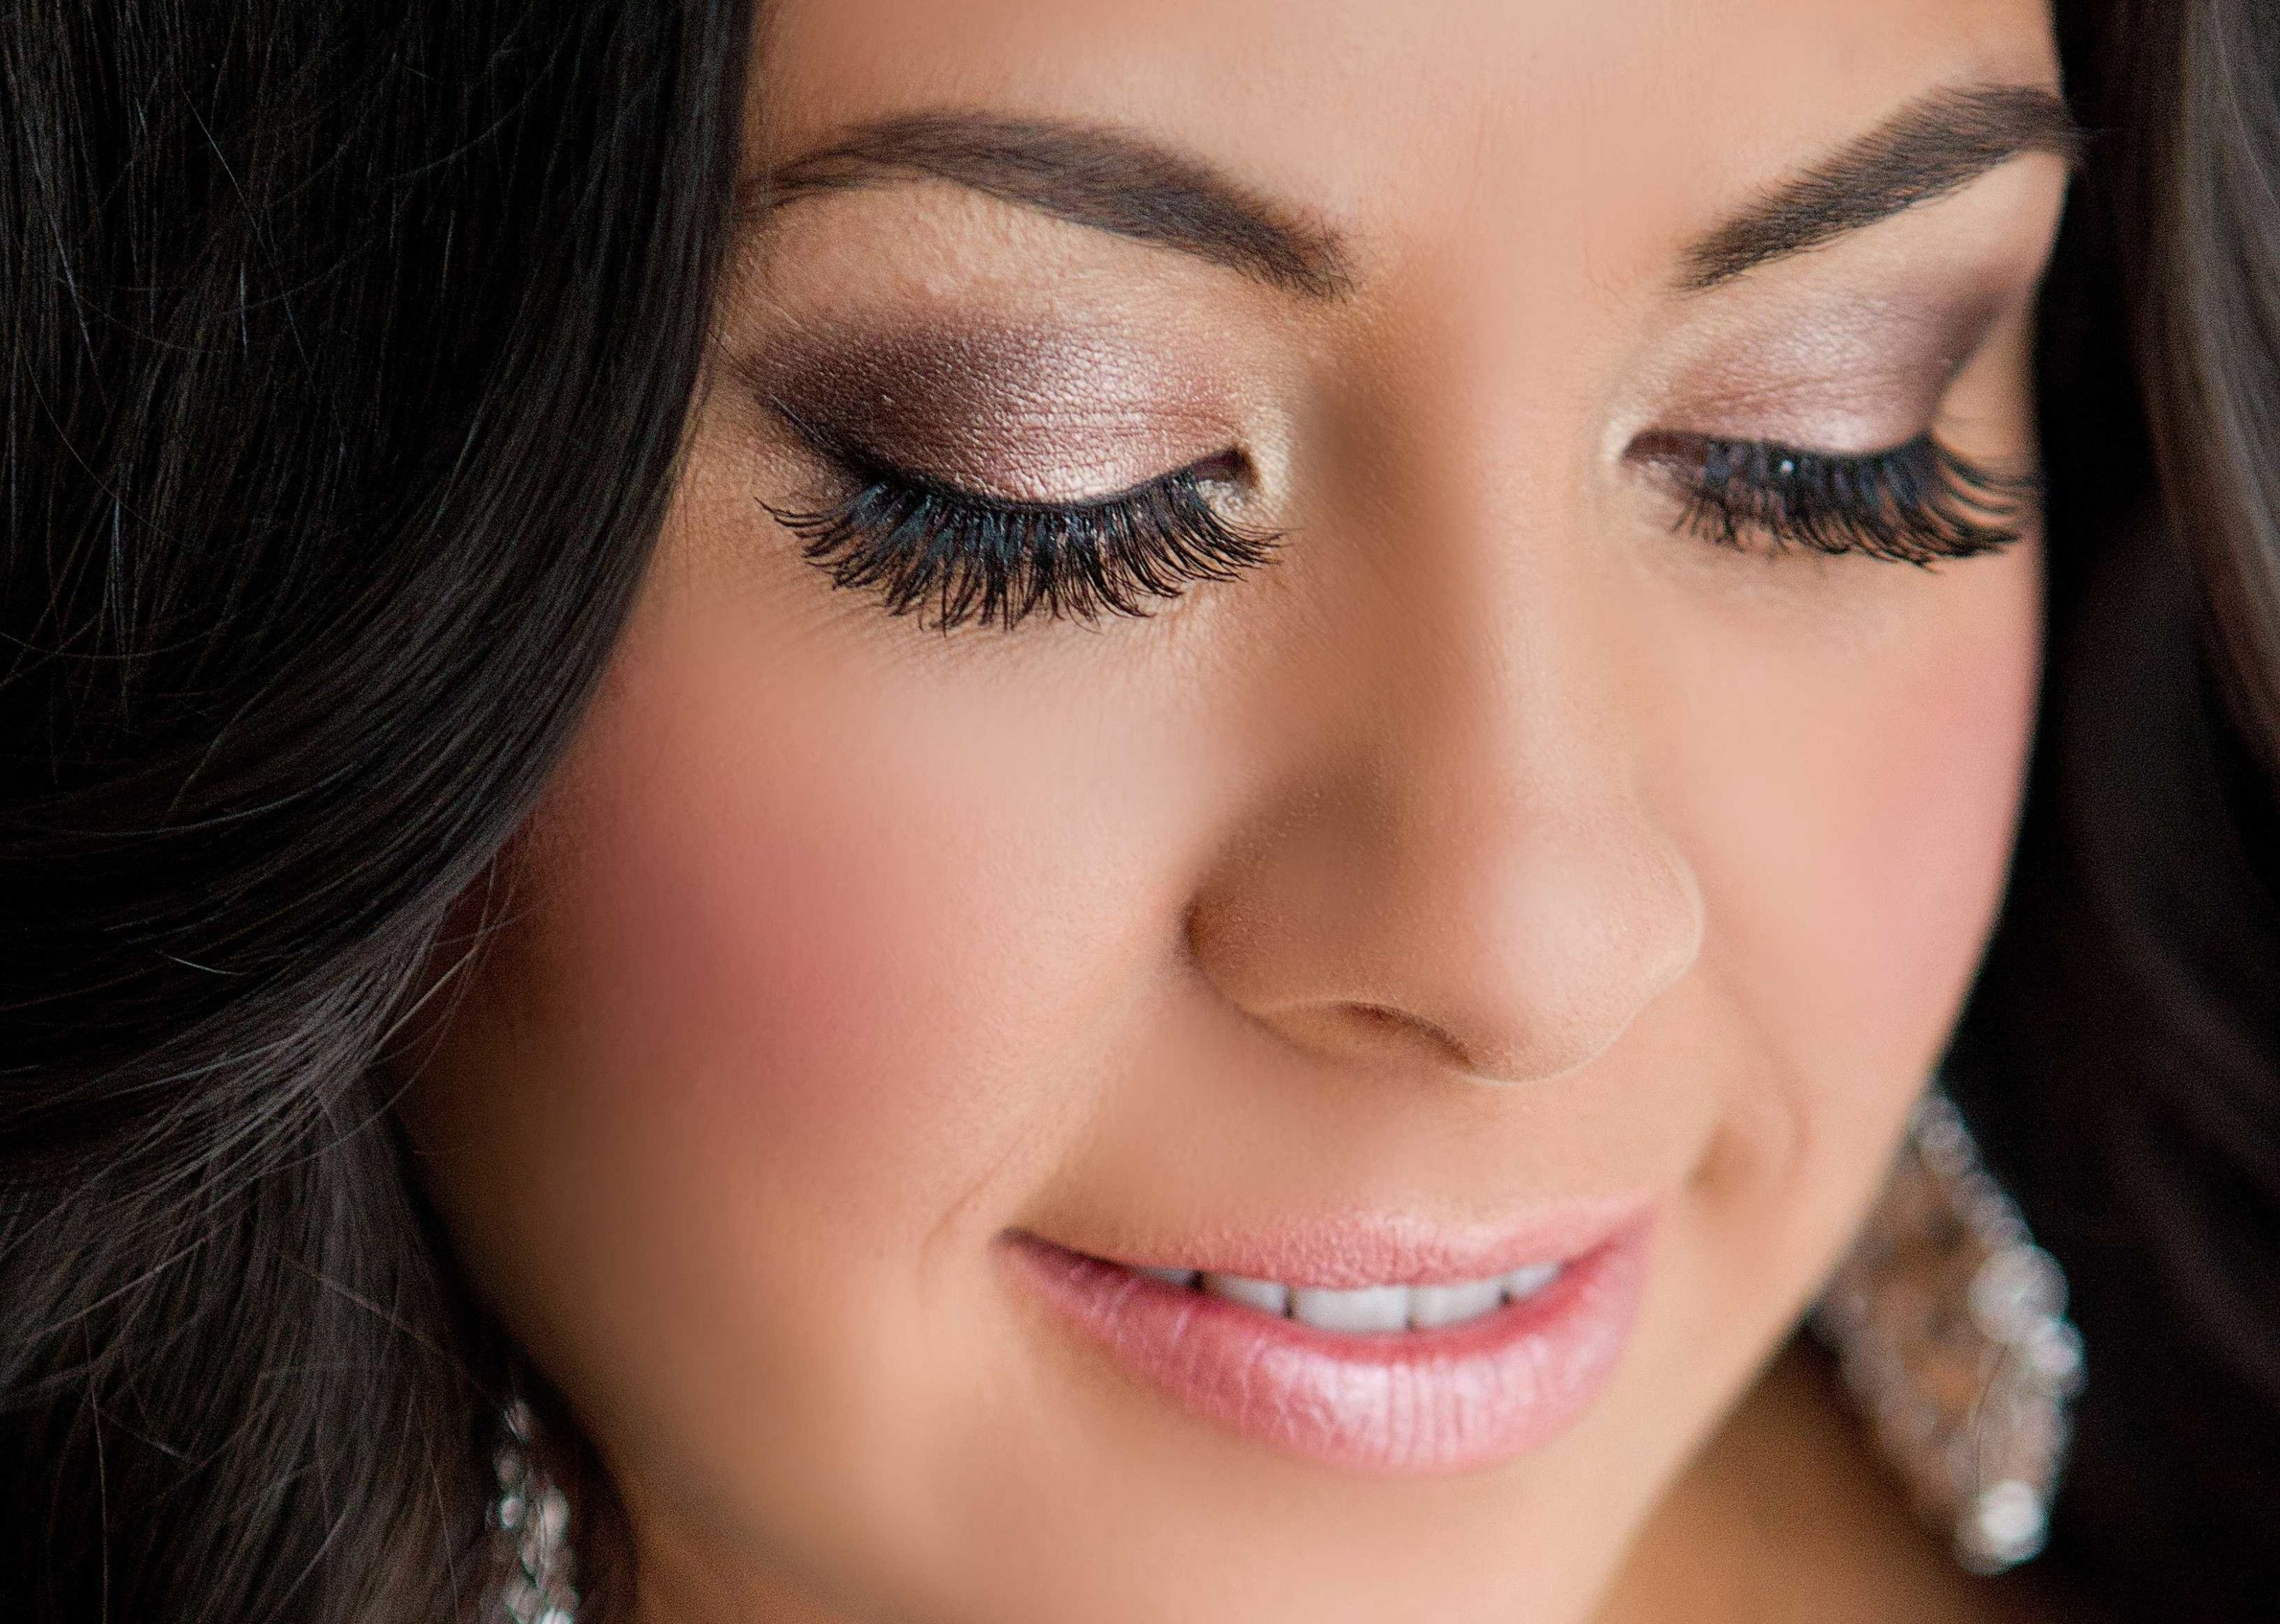 Country Wedding Makeup Brown Eyes | Wedding Geeks | Pinterest intended for Bridal Makeup For Hazel Eyes